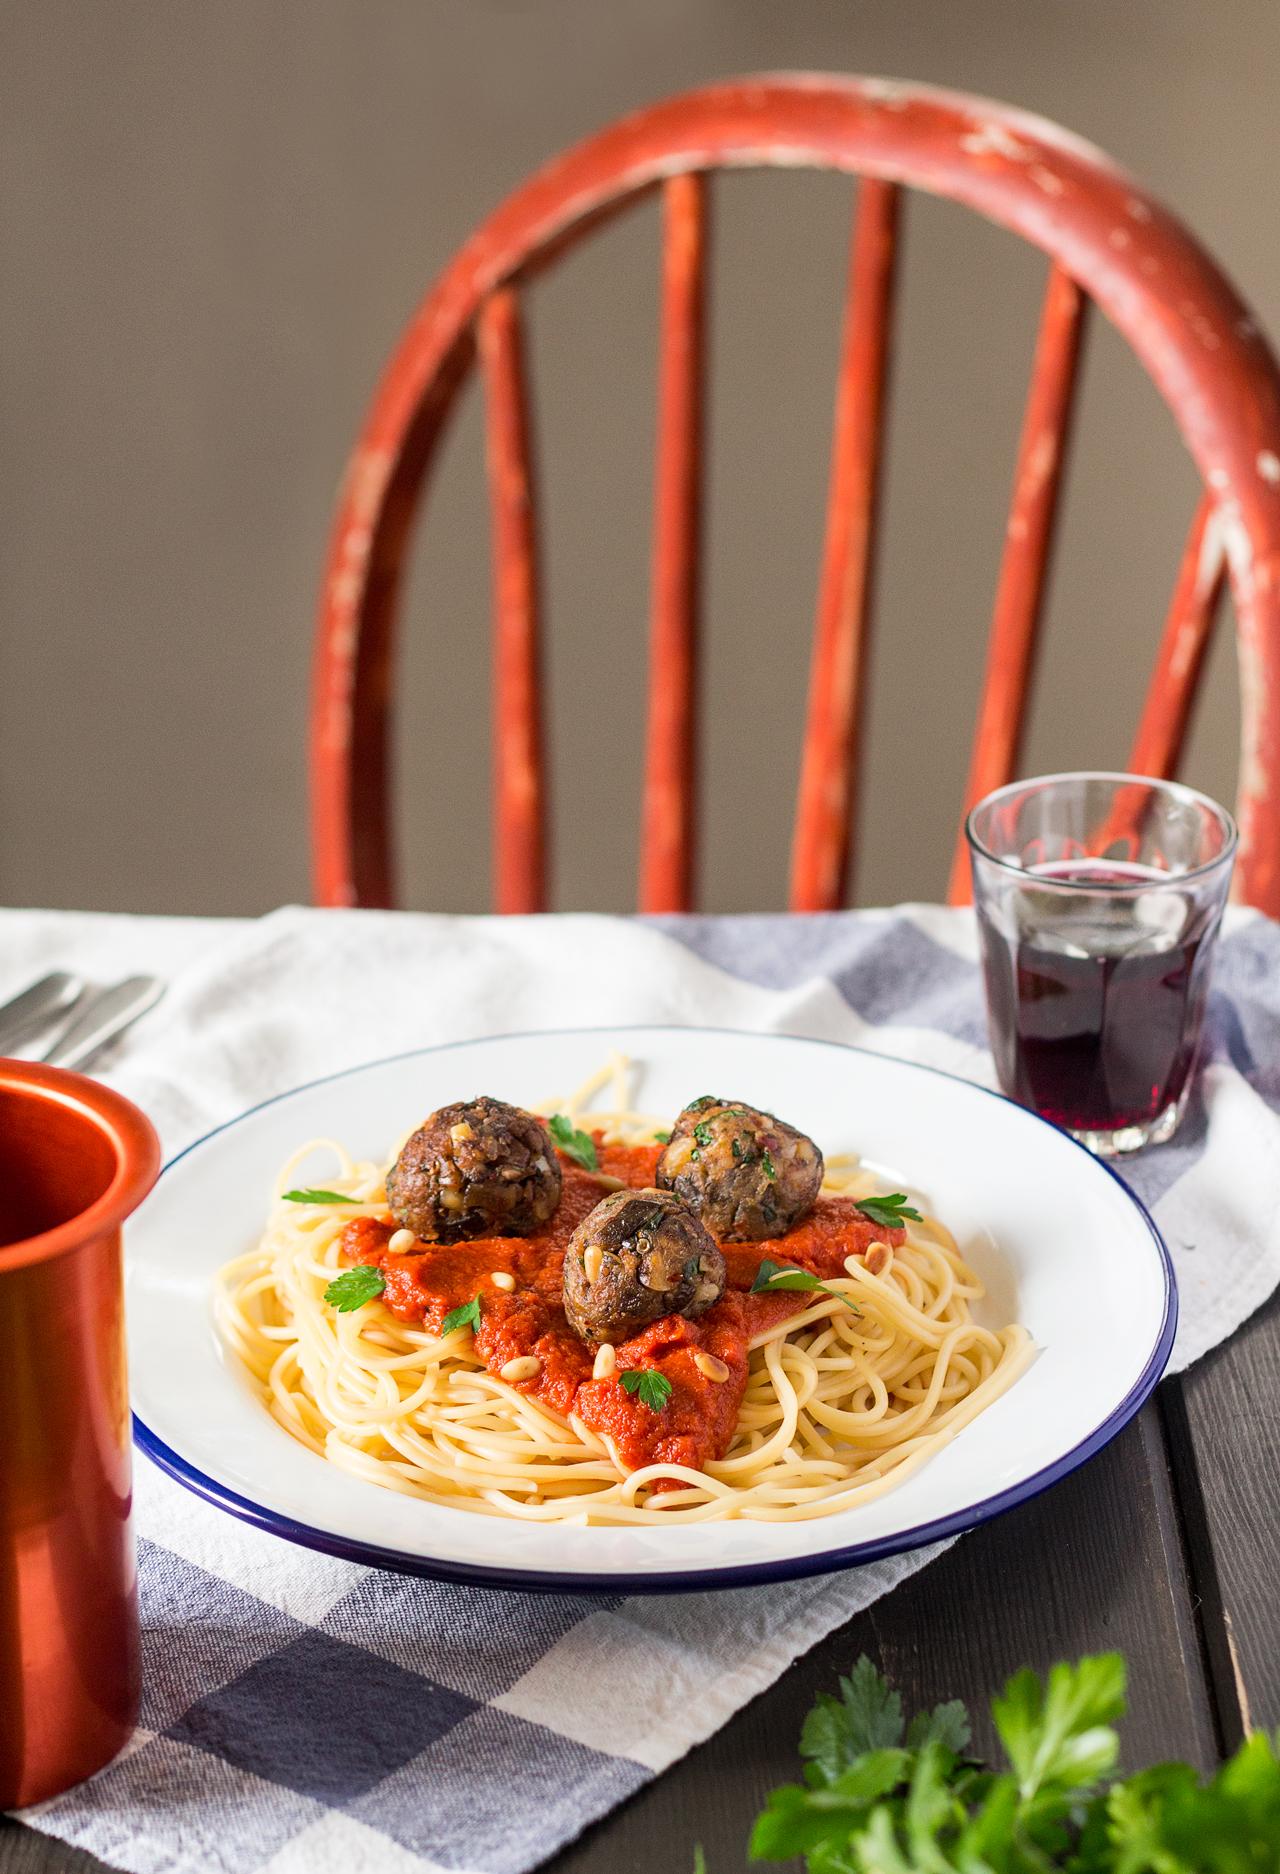 vegan meatballs with spaghetti